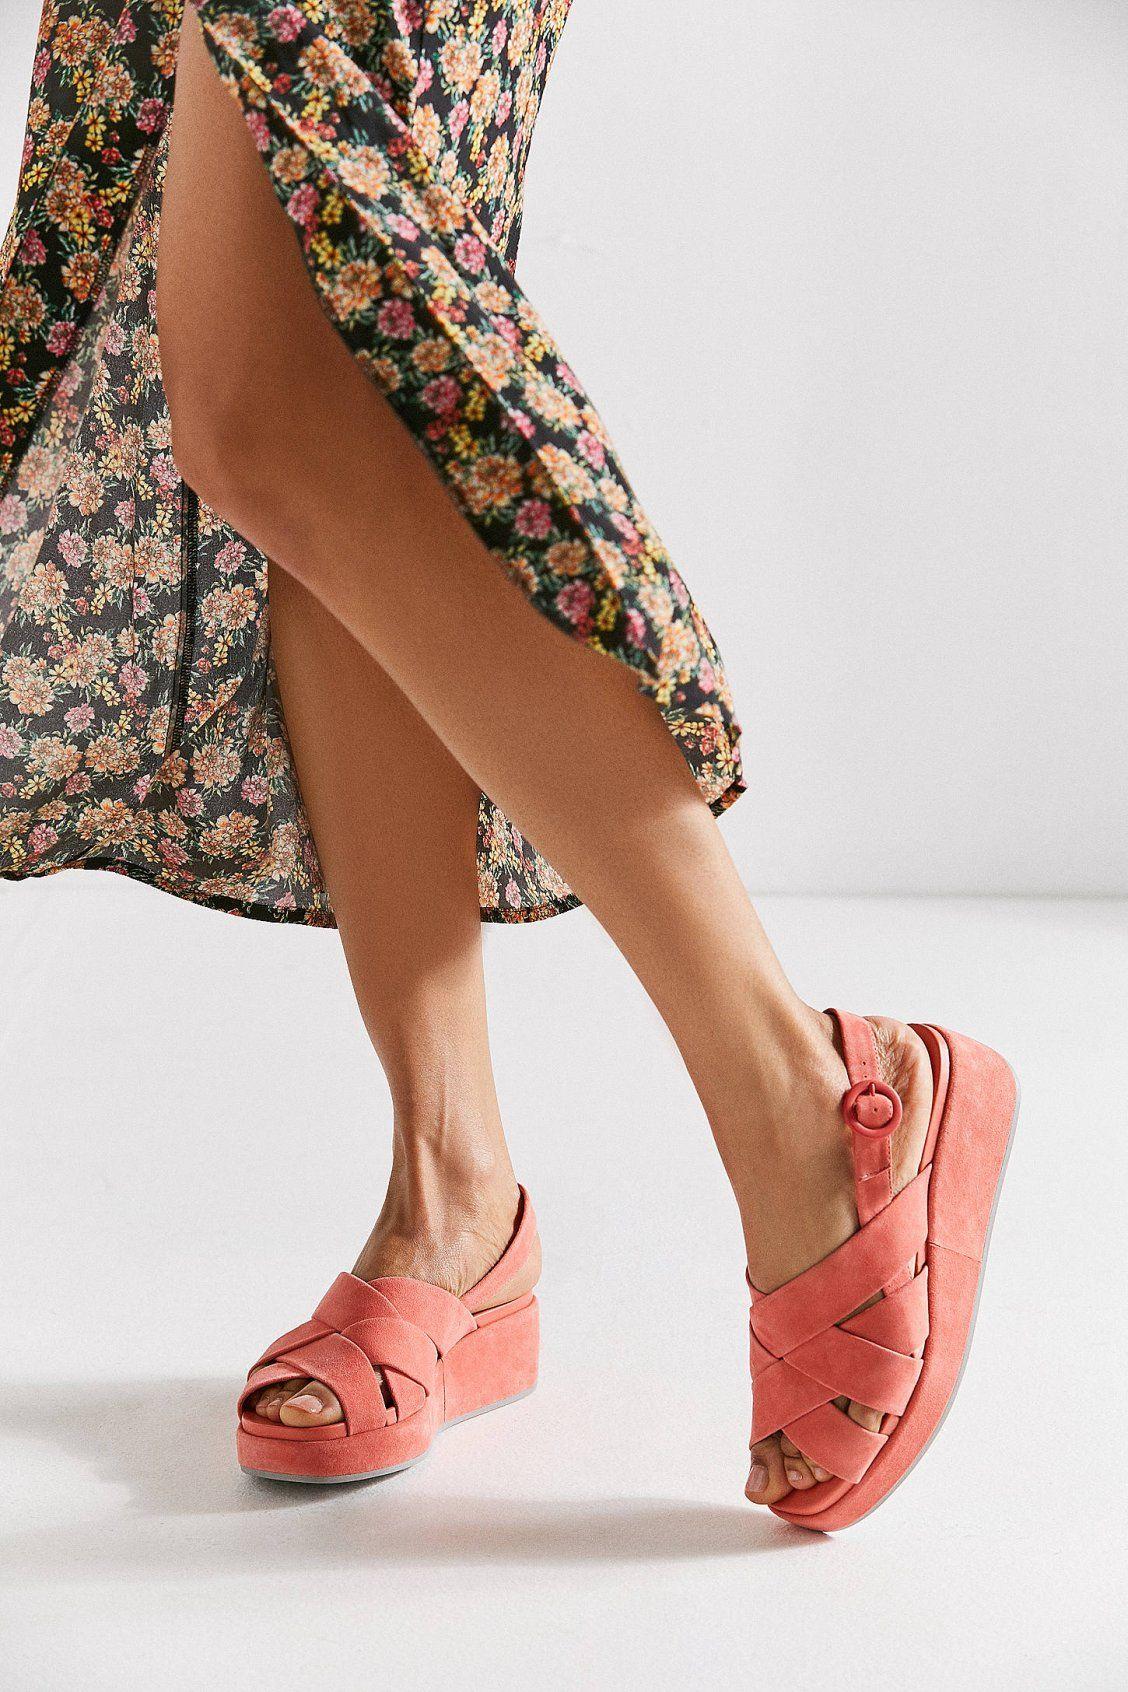 202e0bd1bf21 Shoes on Sale for Women. Camper Misia Flatform Sandals